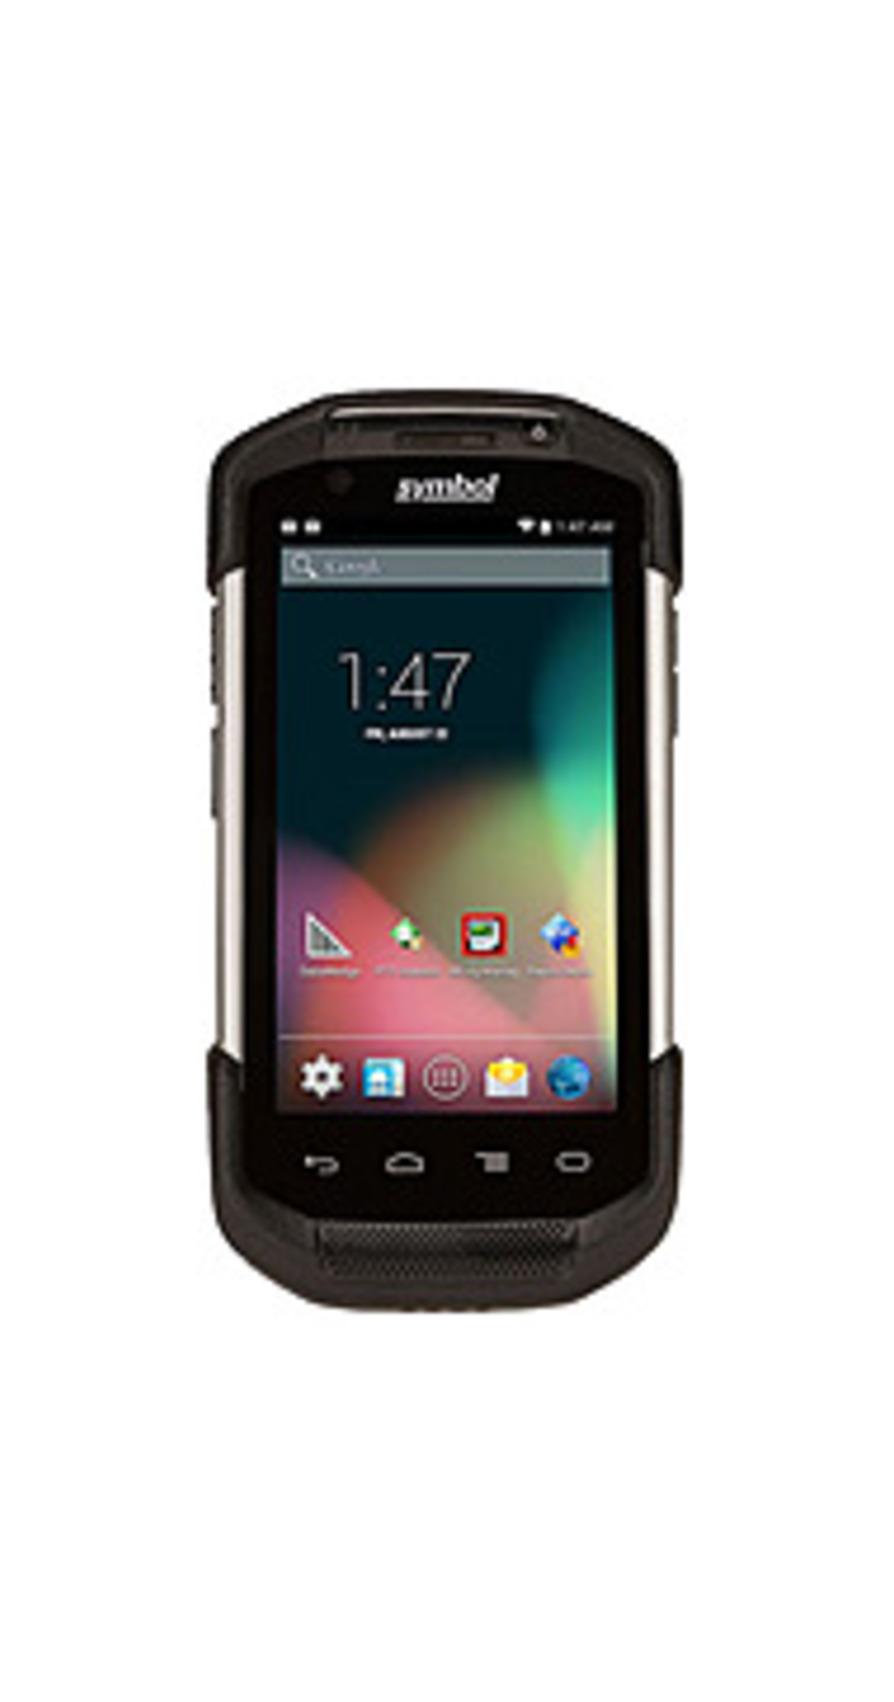 Motorola Symbol TC700H-KC11ES-NA TC70 Handheld Computer - 4.7-inch Display - 1.7 GHz Dual-Core Processor - 1 GB RAM - 8 GB Storage - Wi-Fi - Android 4